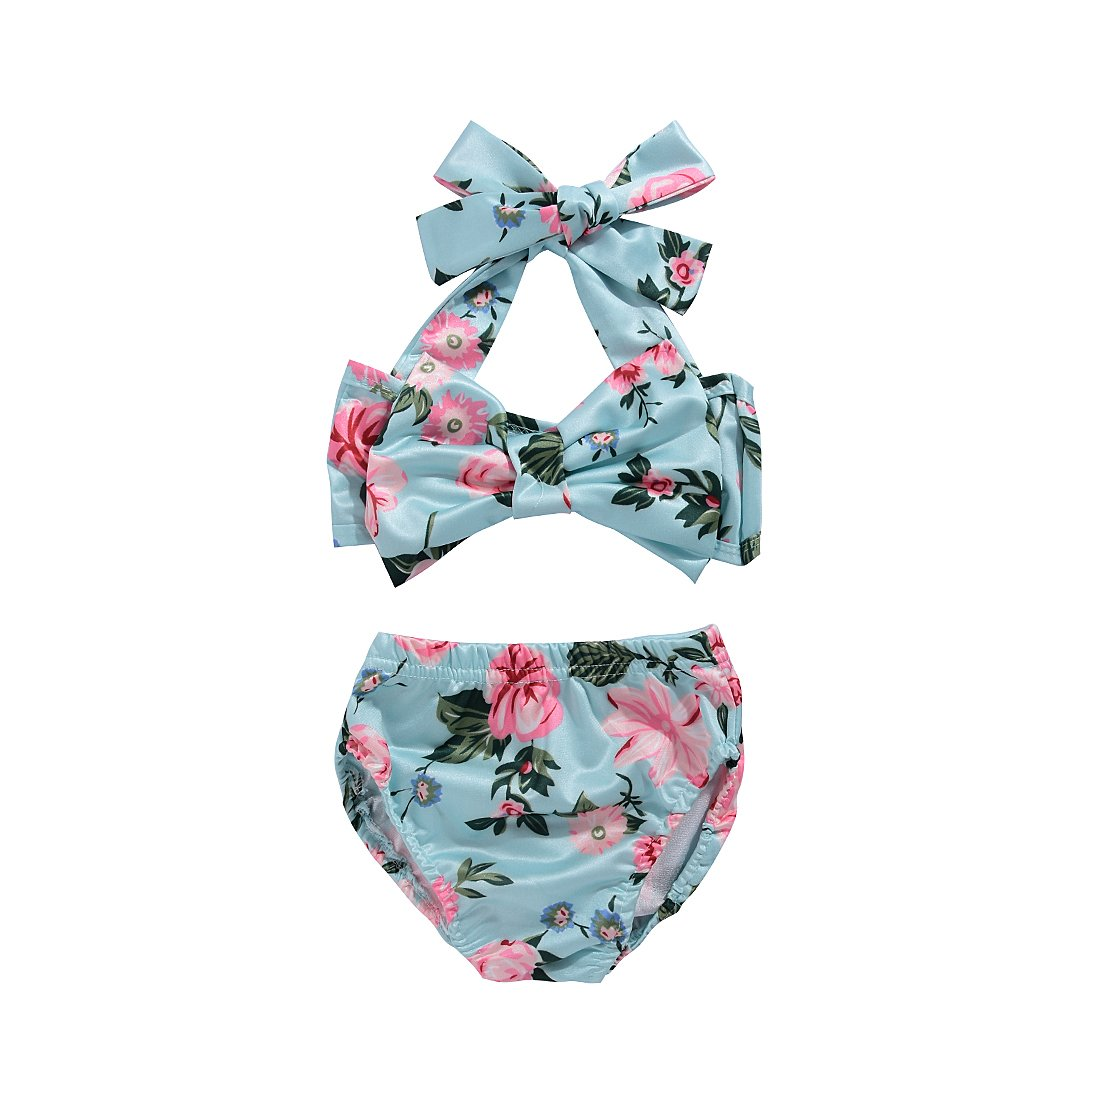 SWNONE 2Pcs Baby Girls Bikini Swimwear Halter Bowknot Top+Floral Short Bottoms Bathing Suit